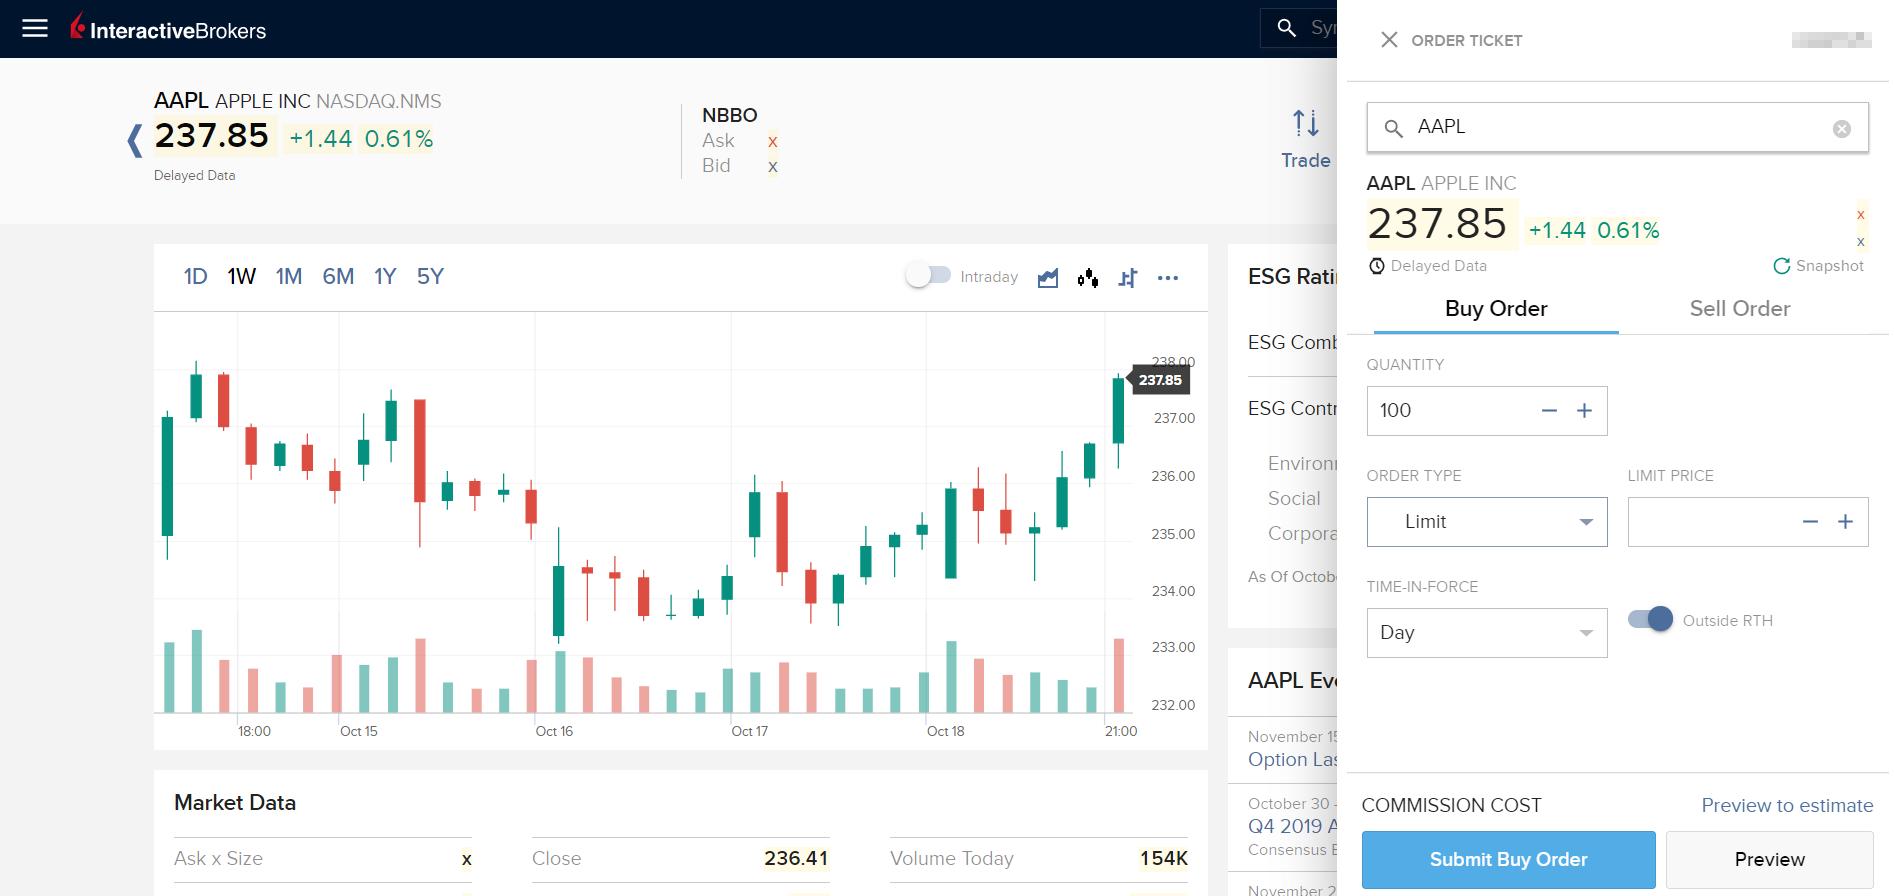 Interactive Brokers review - Web trading platform - Order panel